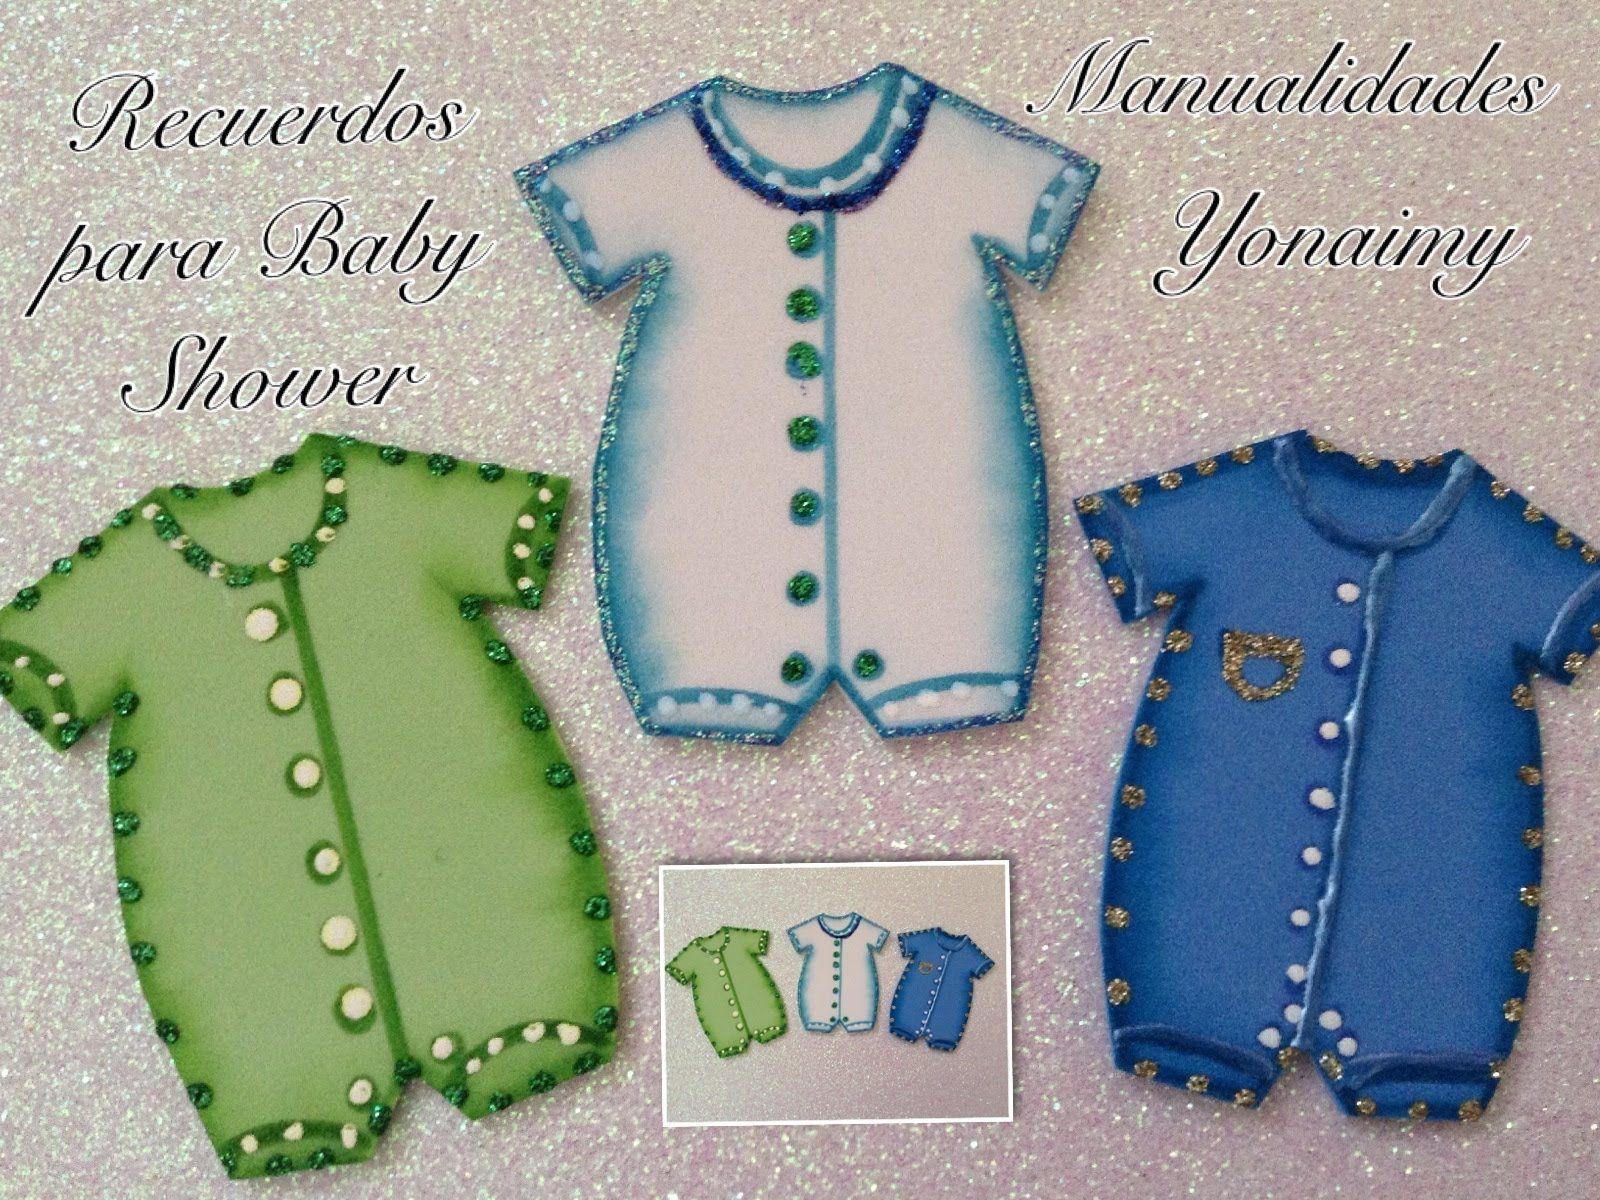 Baby Shower Manualidades Recuerdos ~ Mameluco de niÑo para baby shower hecho foamy o goma